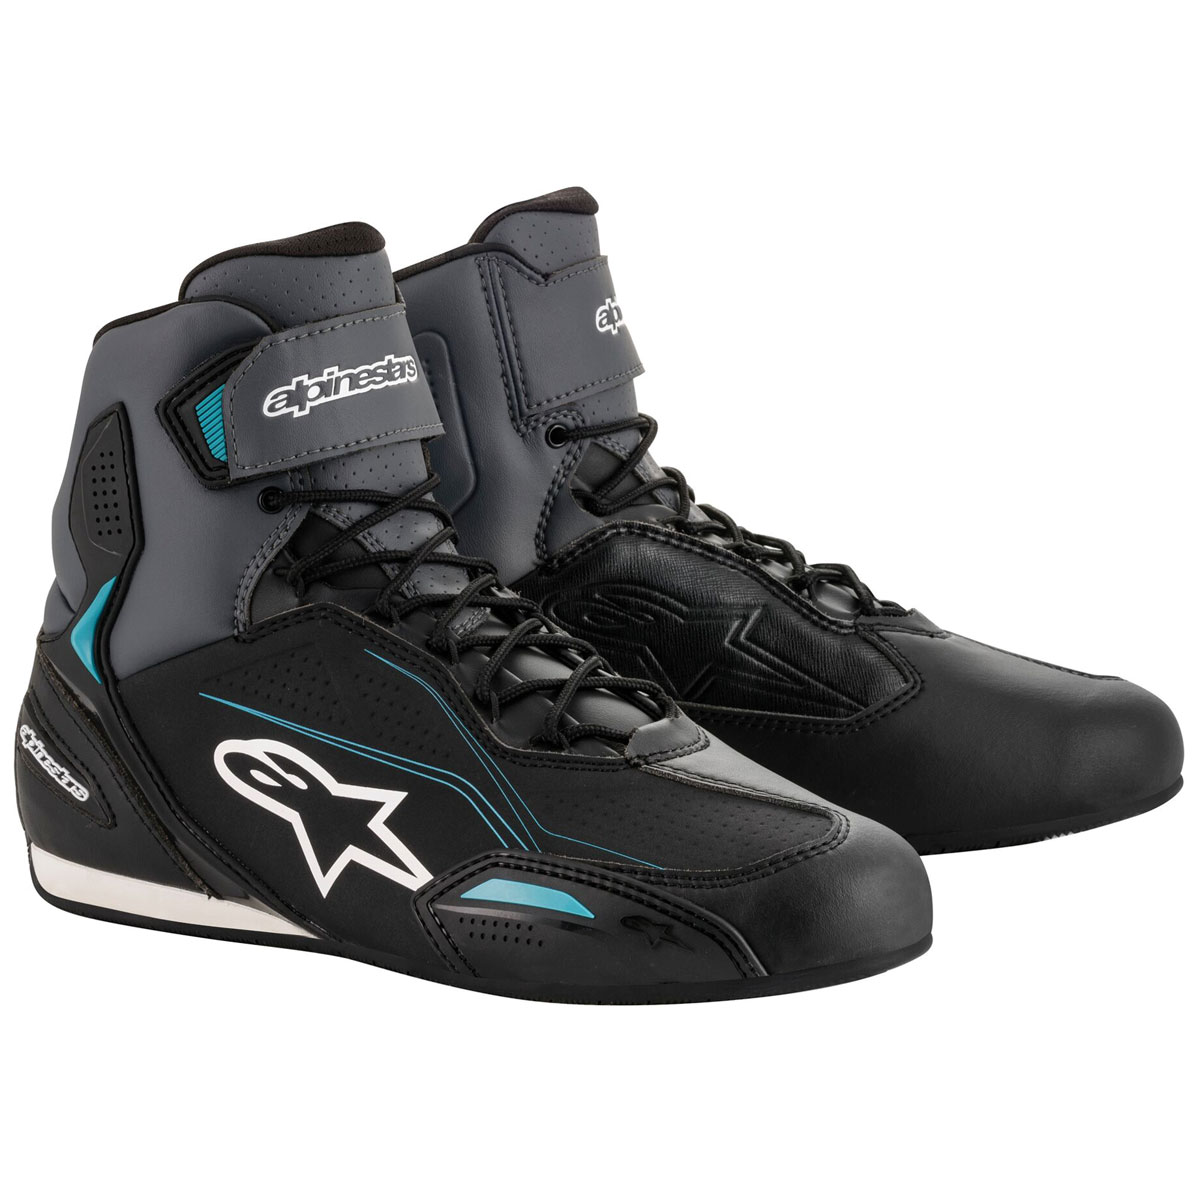 Alpinestars Women's Stella Faster-3 Black/Gray/Ocean Boots